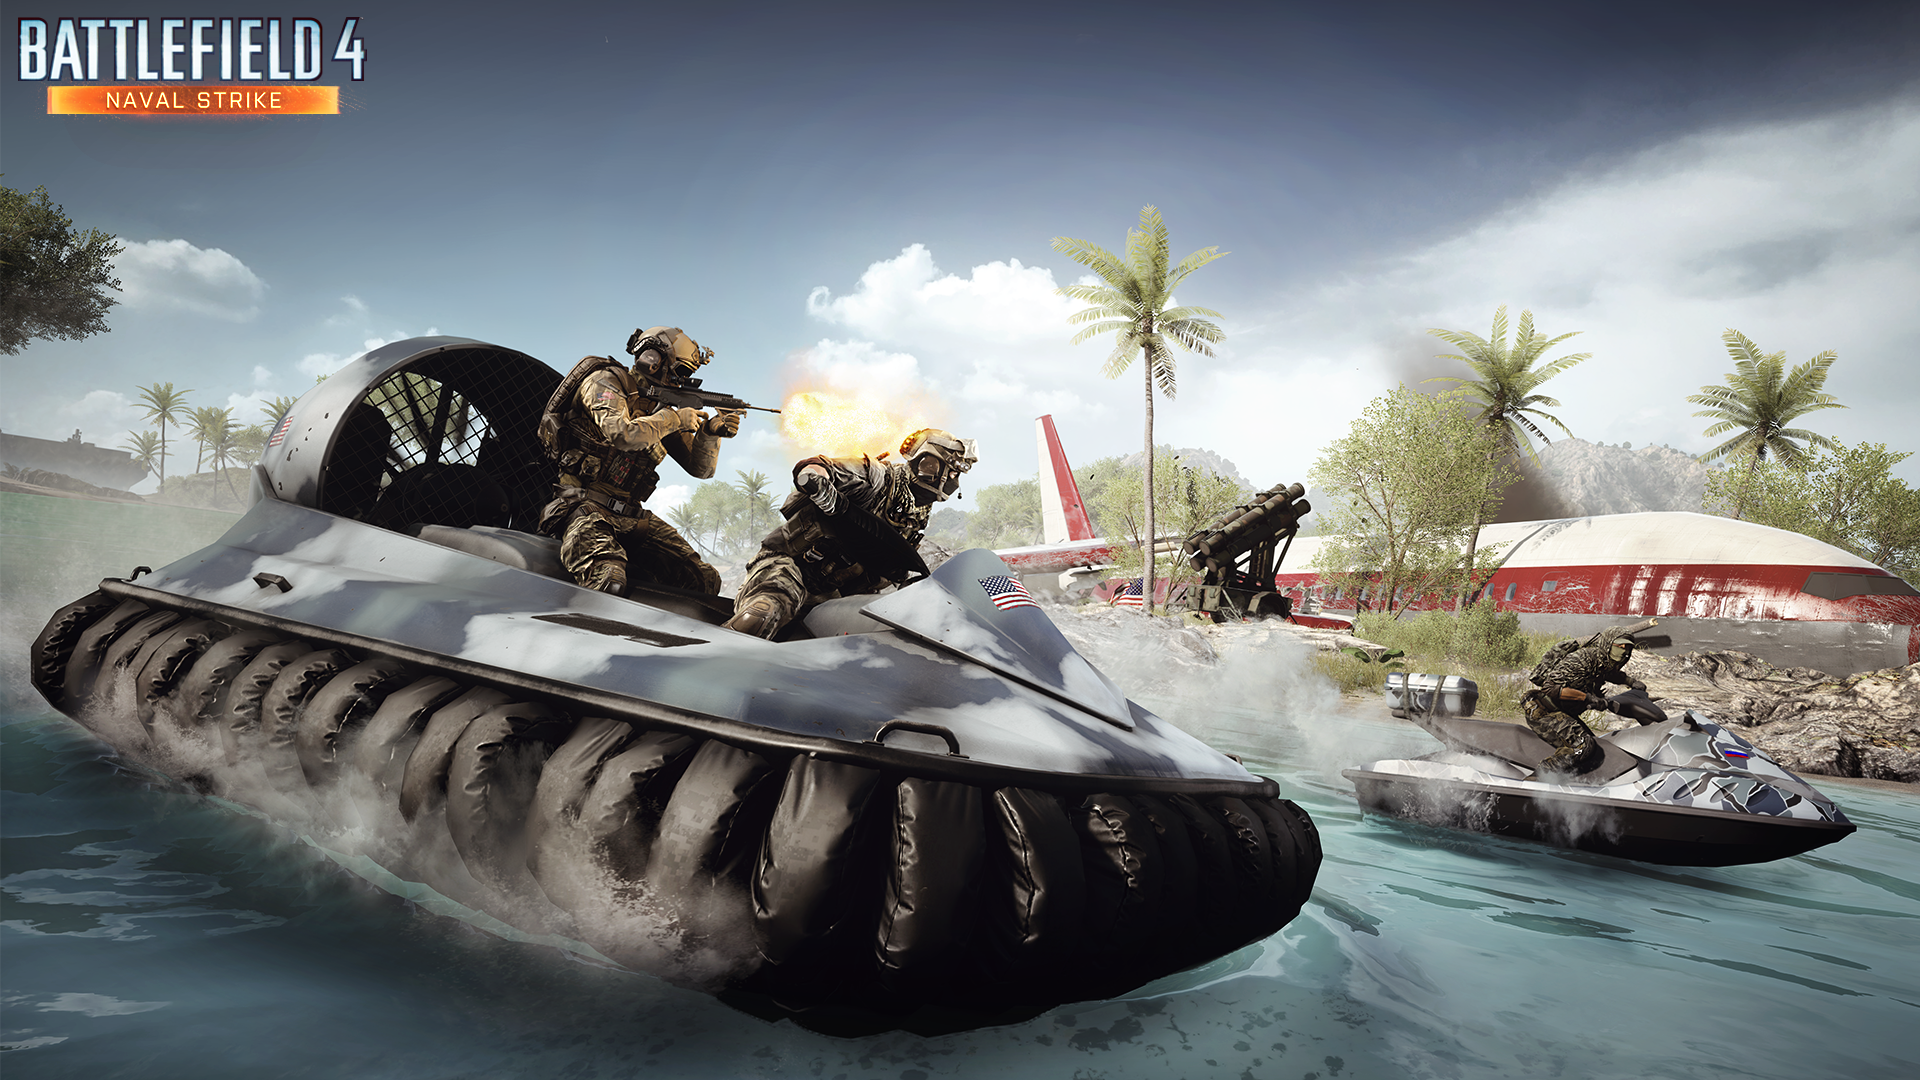 battlefield-4-naval-strike-hovercraft_wm-100250970-orig